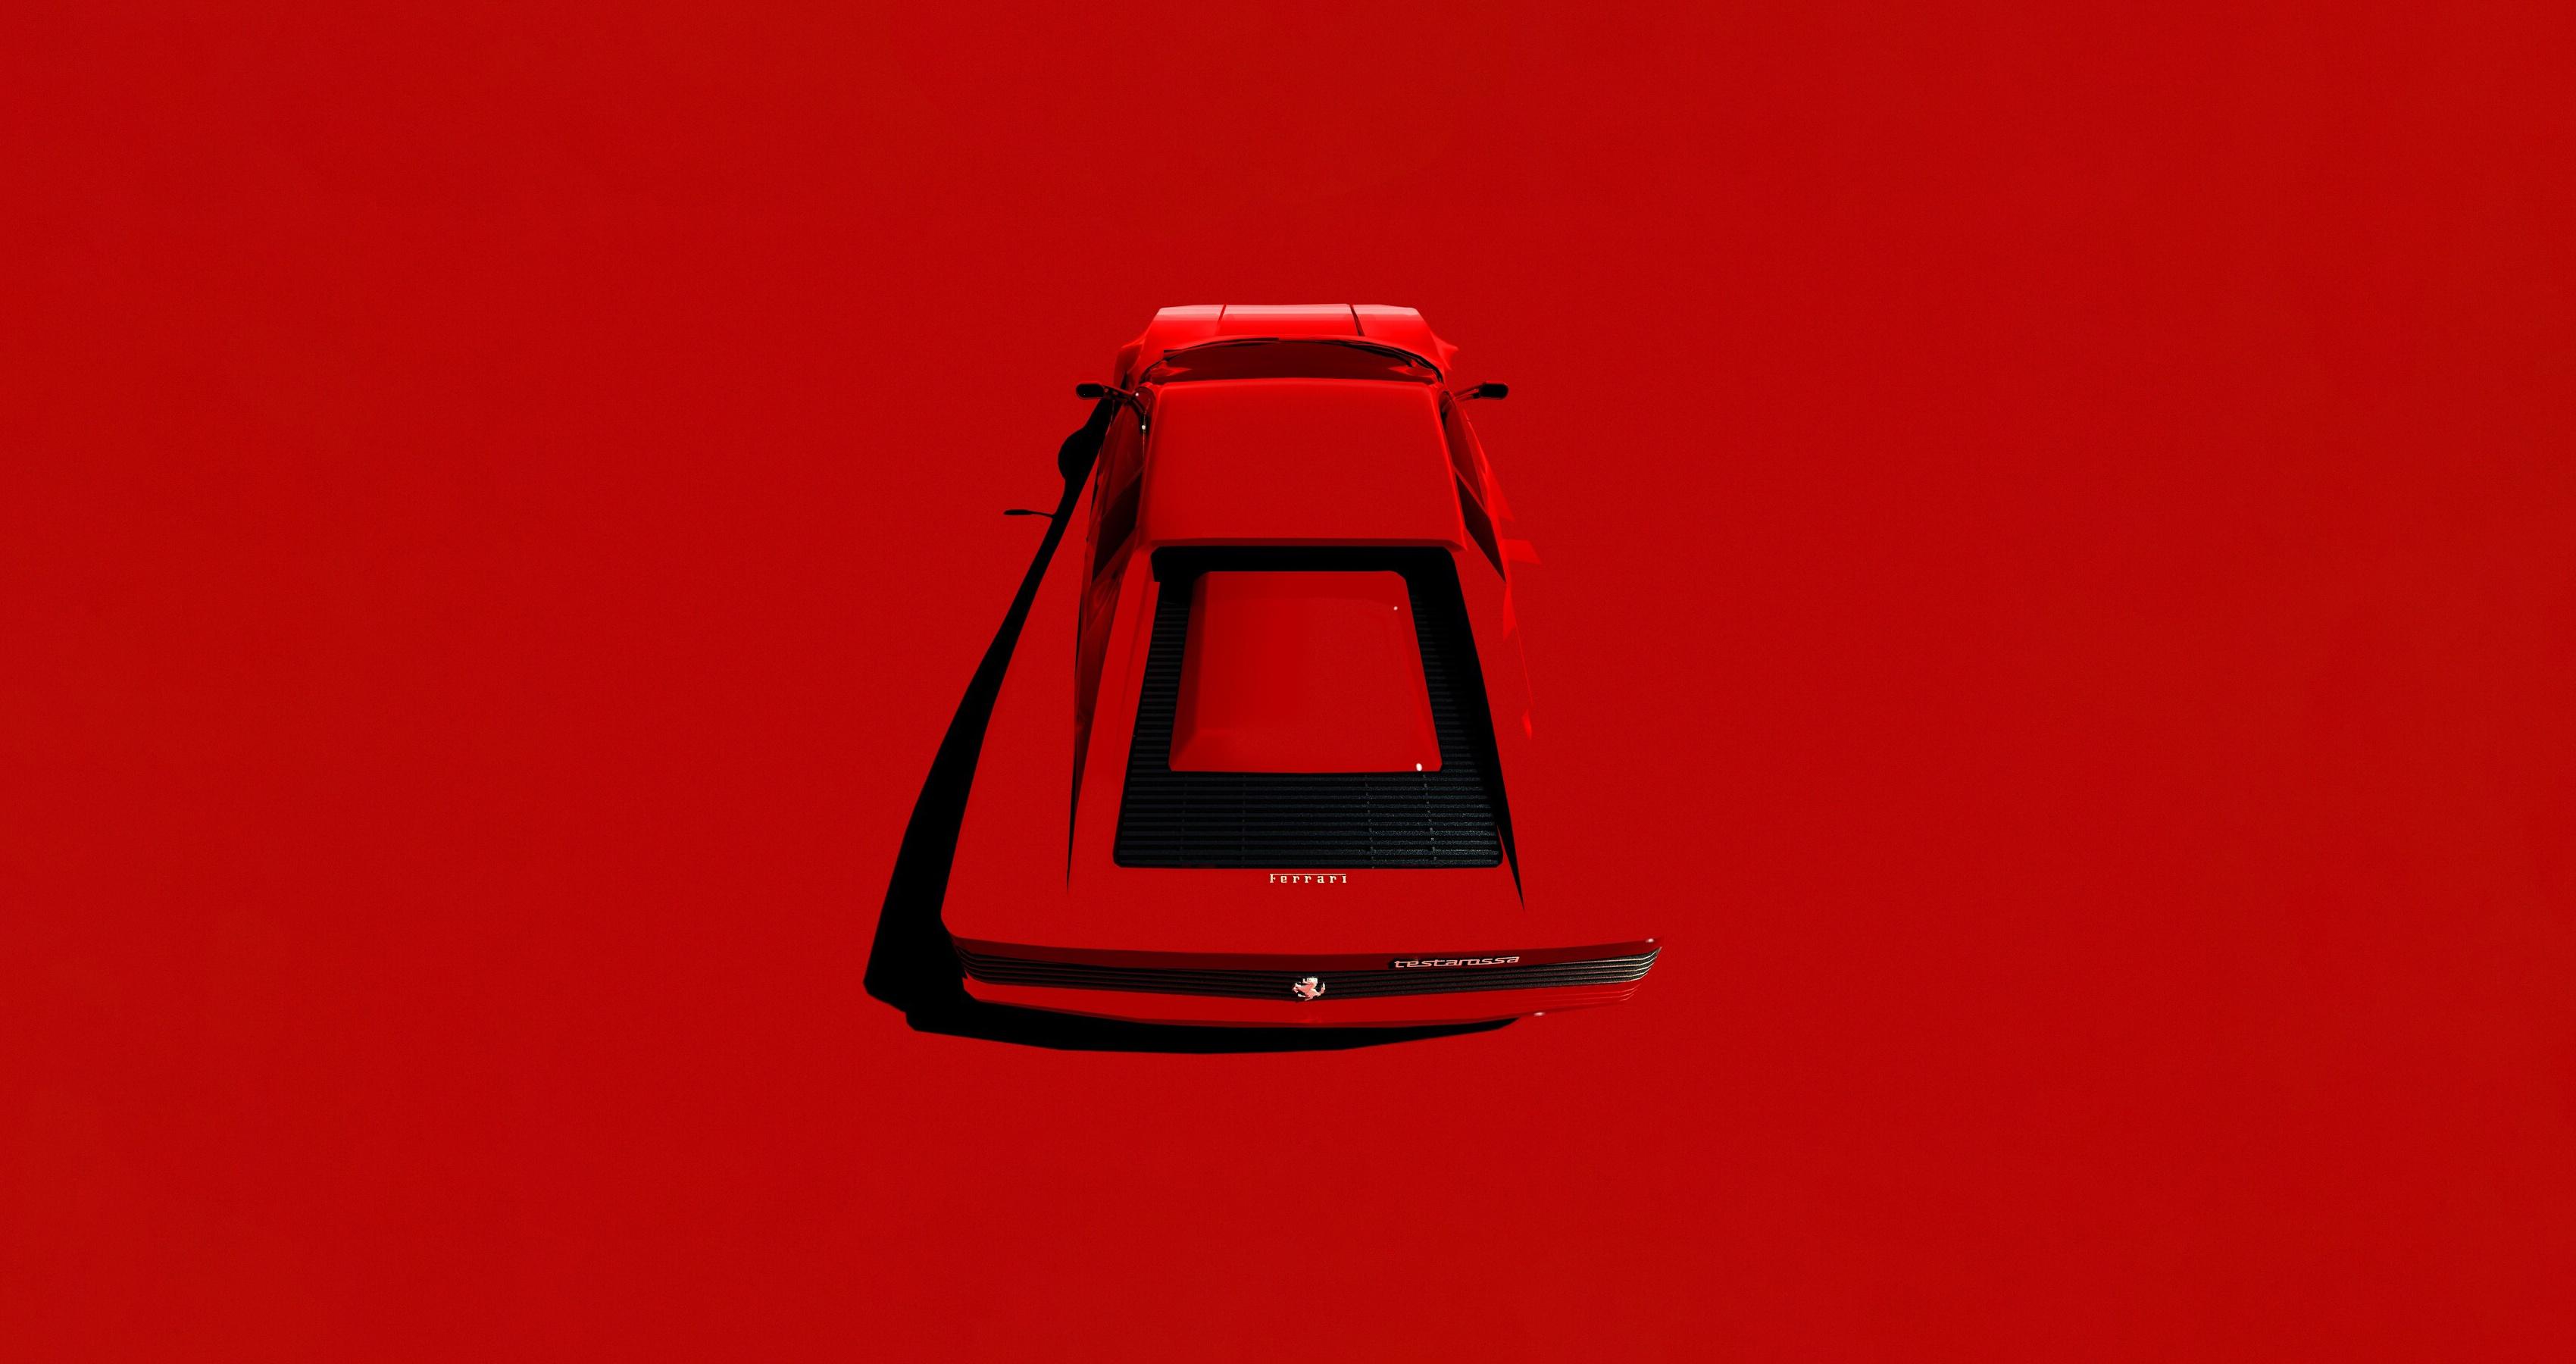 Get Minimalist Wallpaper Ferrari  Images